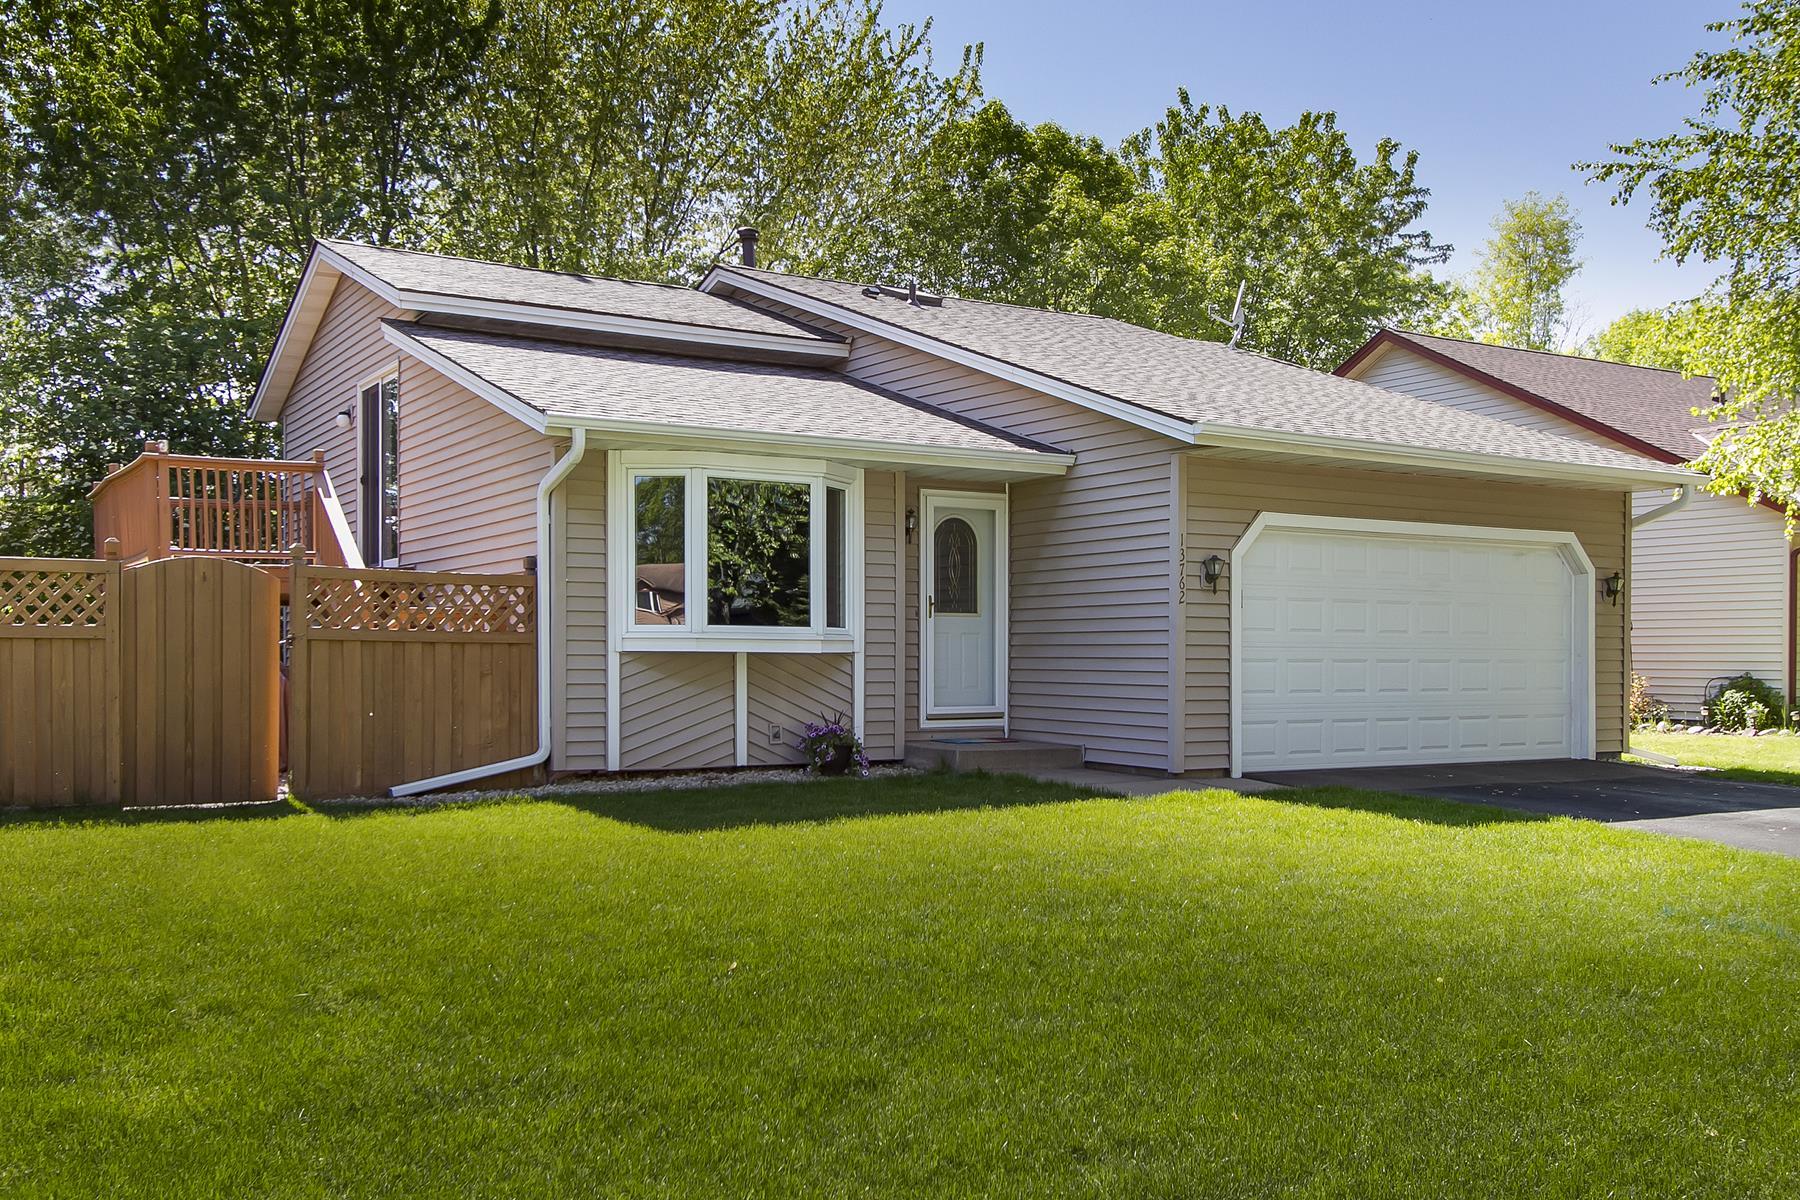 Single Family Home for Sale at 13762 Glenhurst Lane Savage, Minnesota, 55378 United States